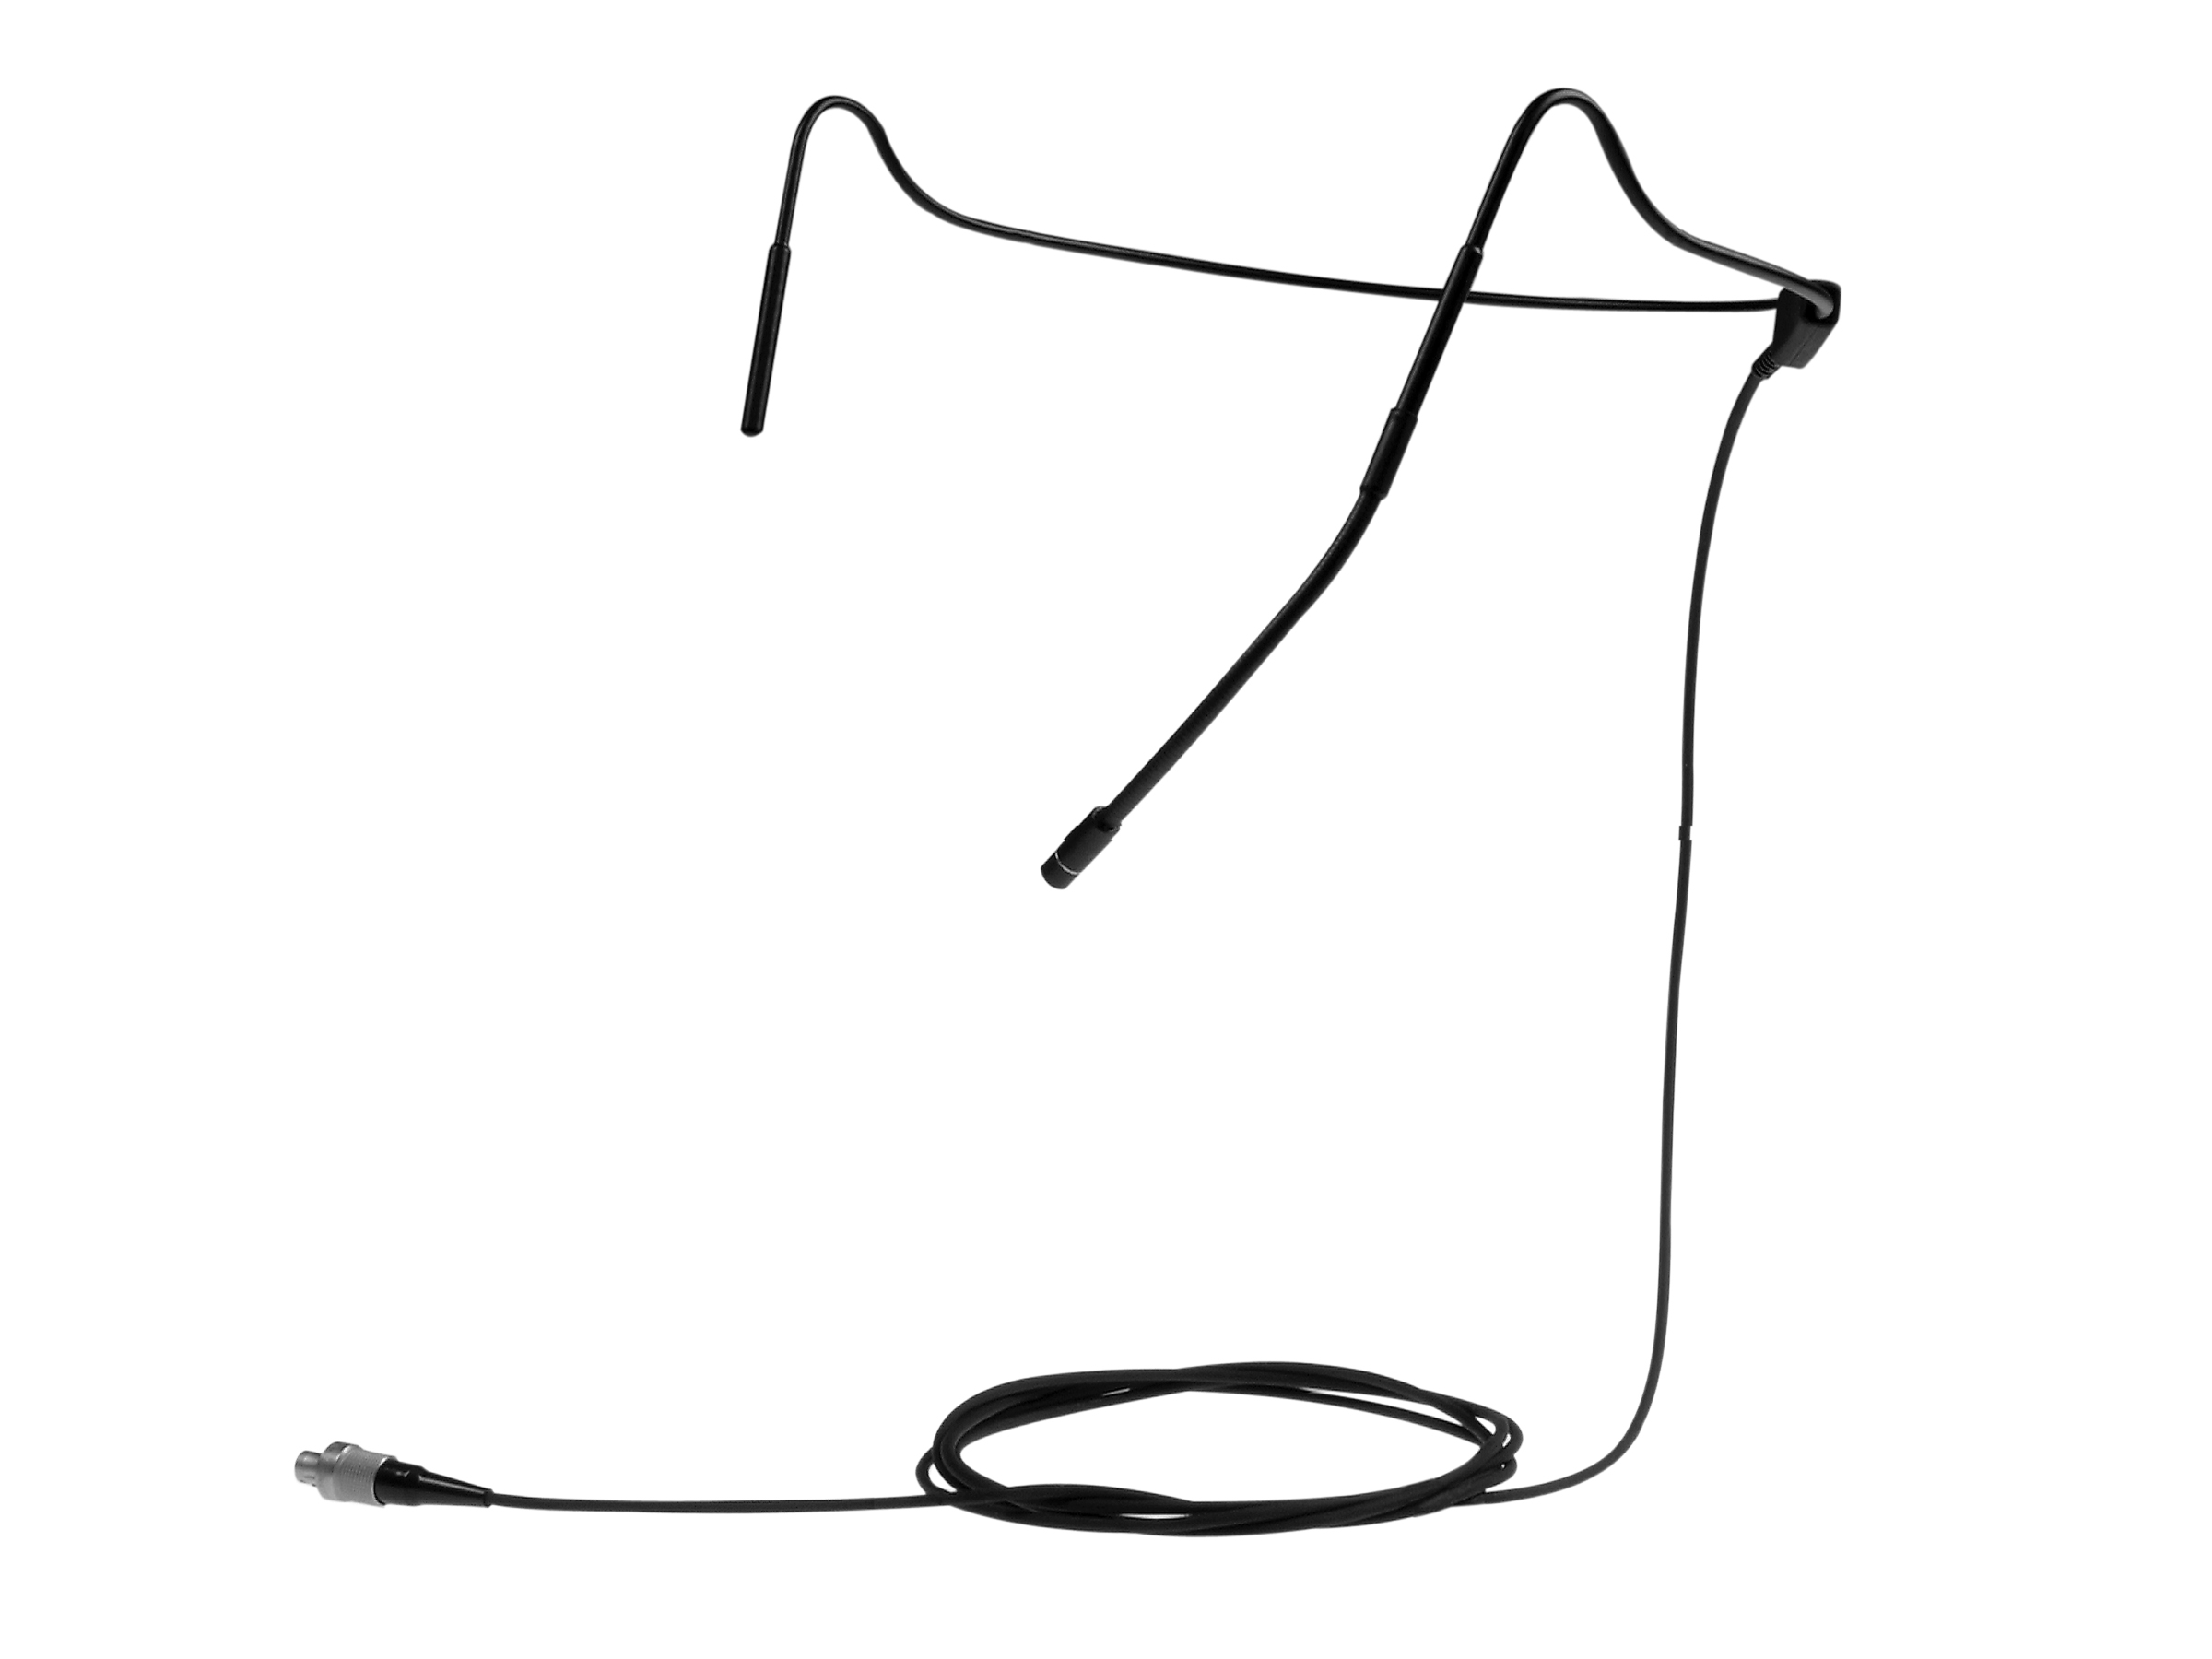 sennheiser hs 2 - microfon headset